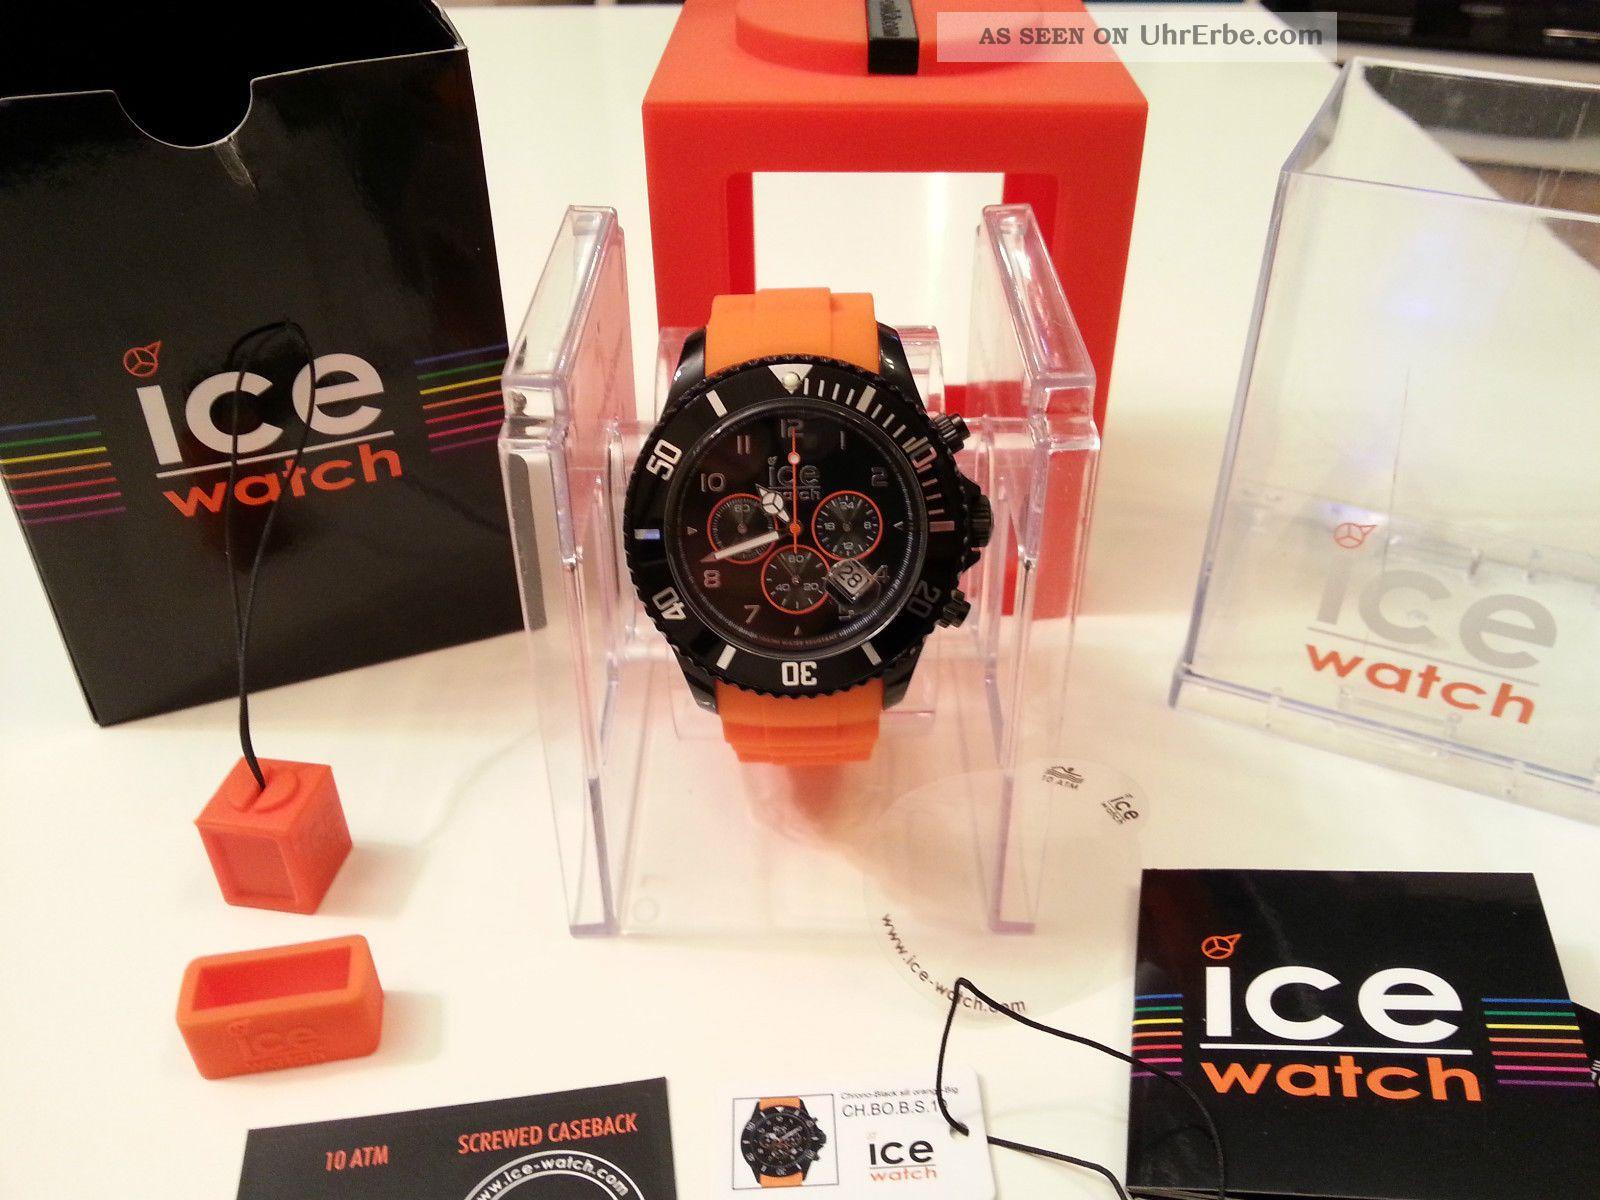 Ice Watch Black / Orange Chrono 48mm Neuwertig Aus Sammlung Ch.  Bo.  B.  S.  10 Armbanduhren Bild